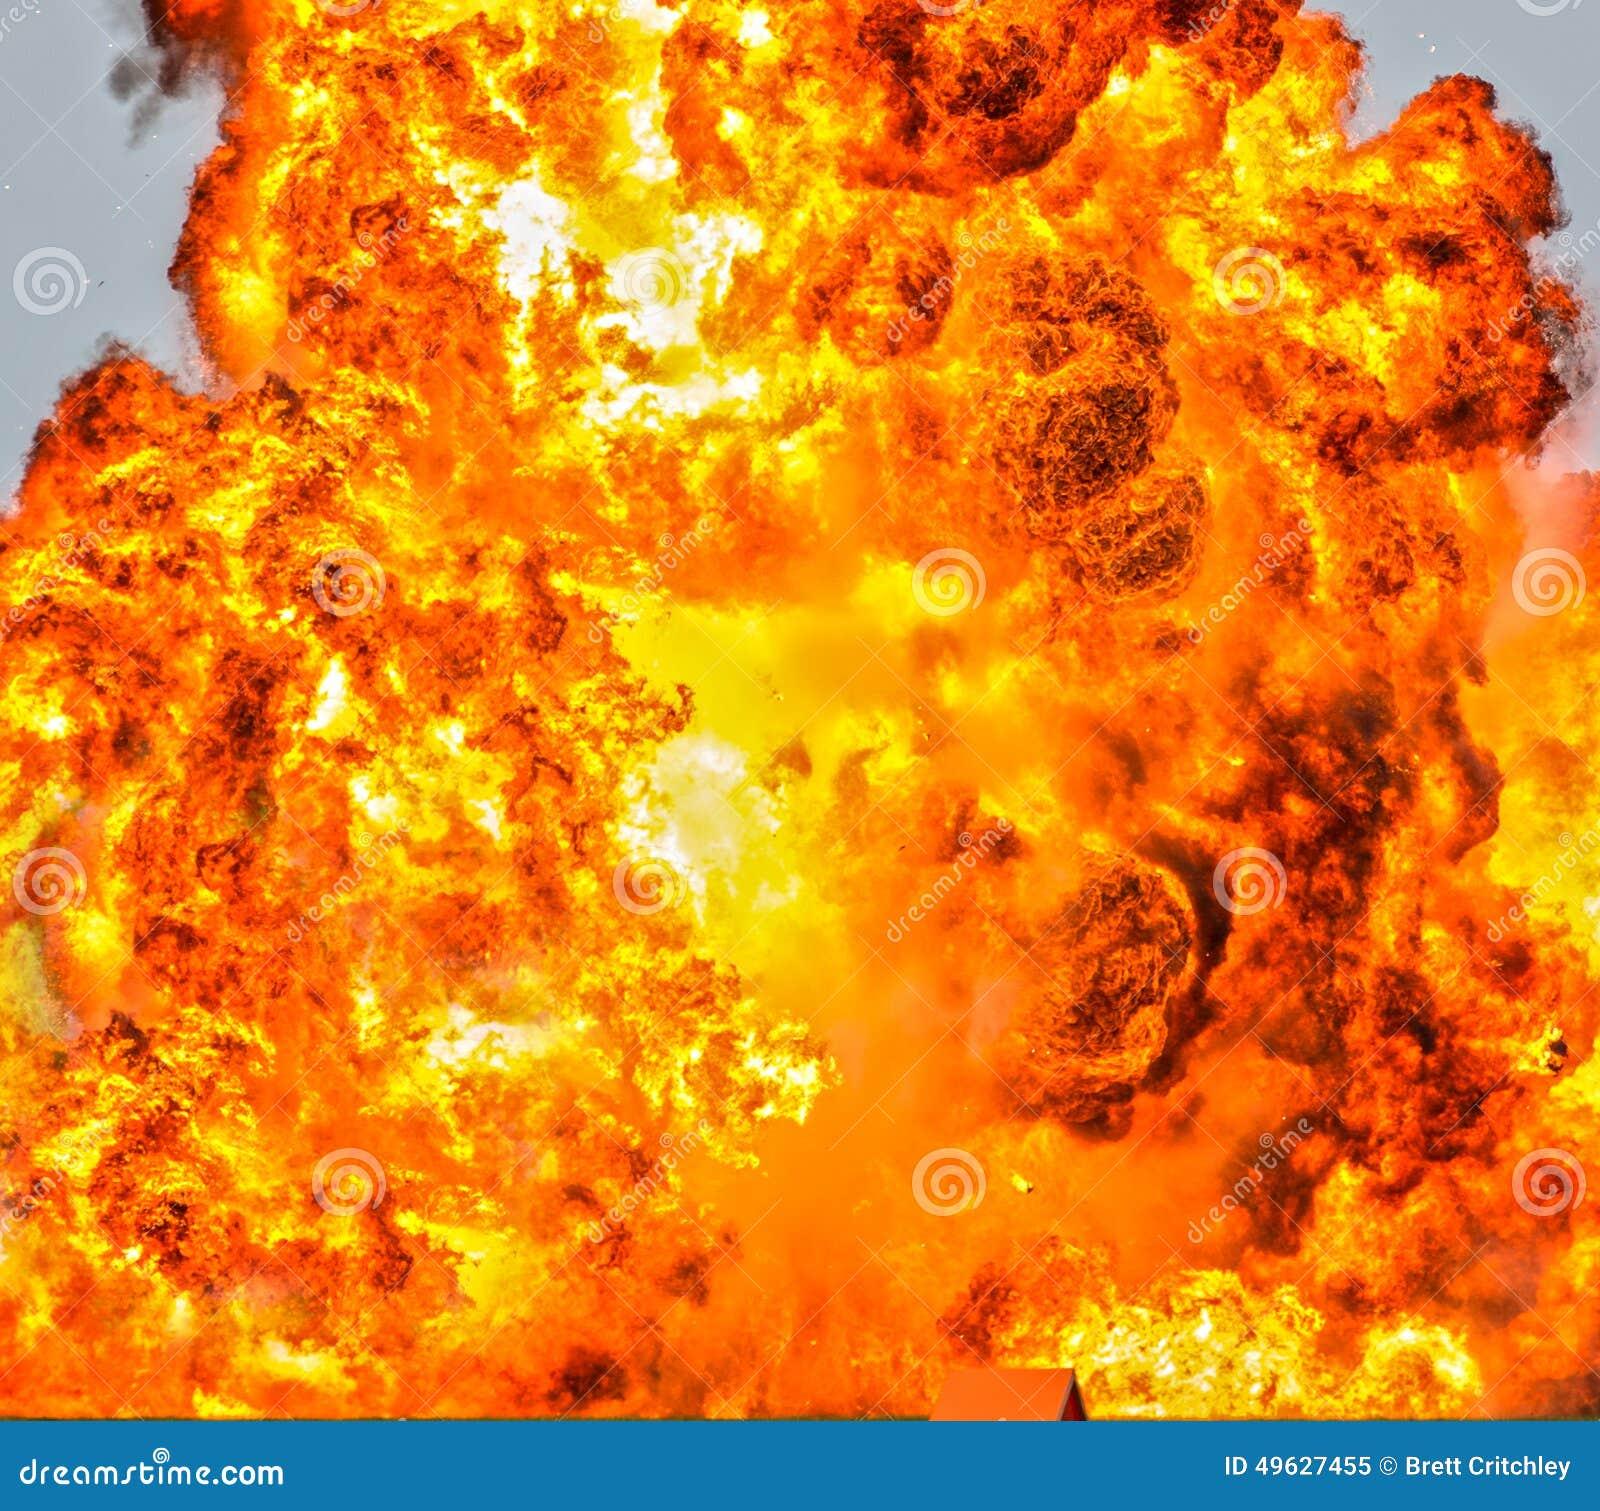 Inferno fire background